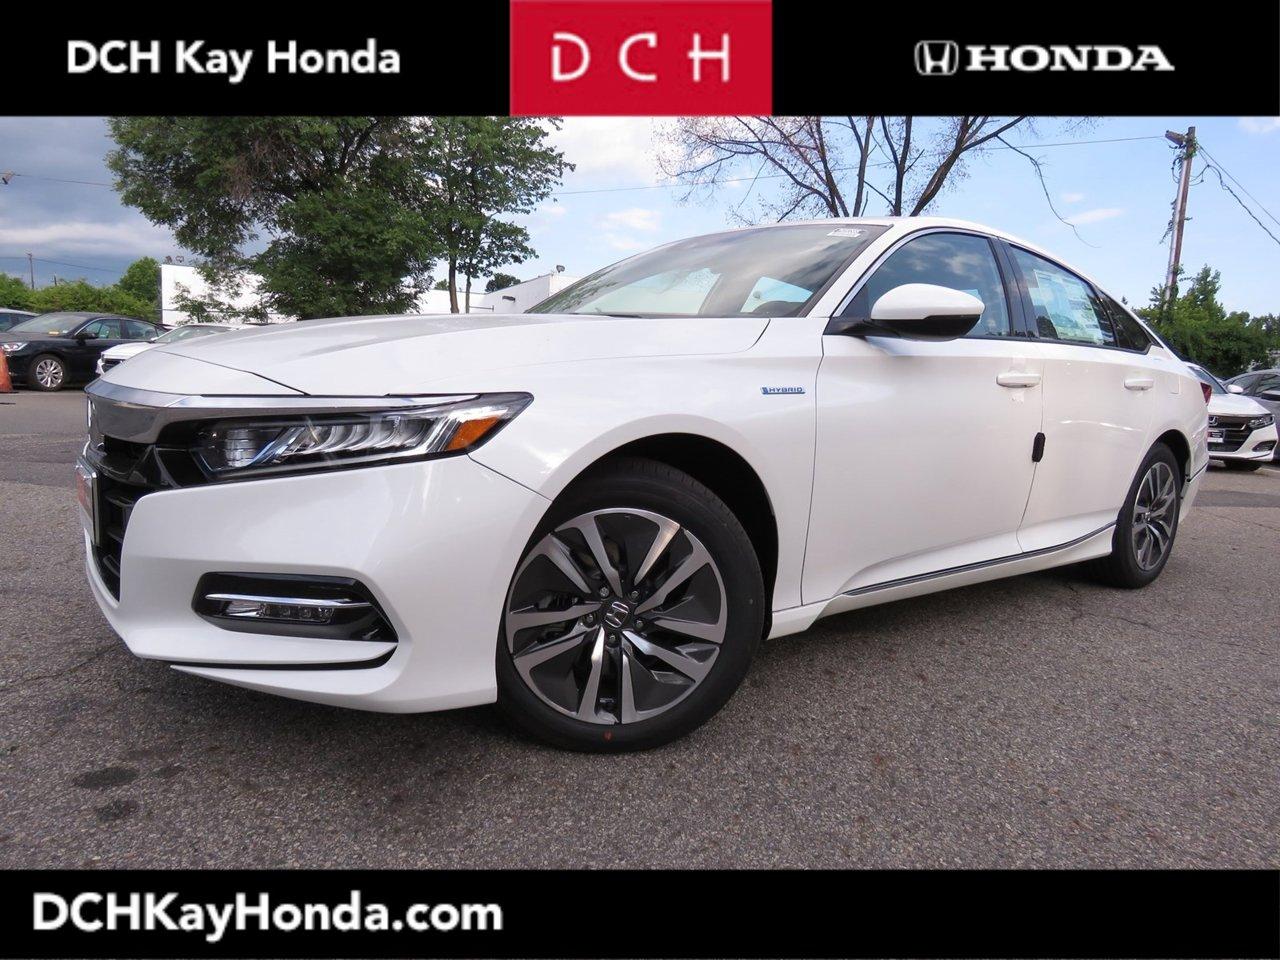 New 2020 Honda Accord Hybrid in Eatontown, NJ